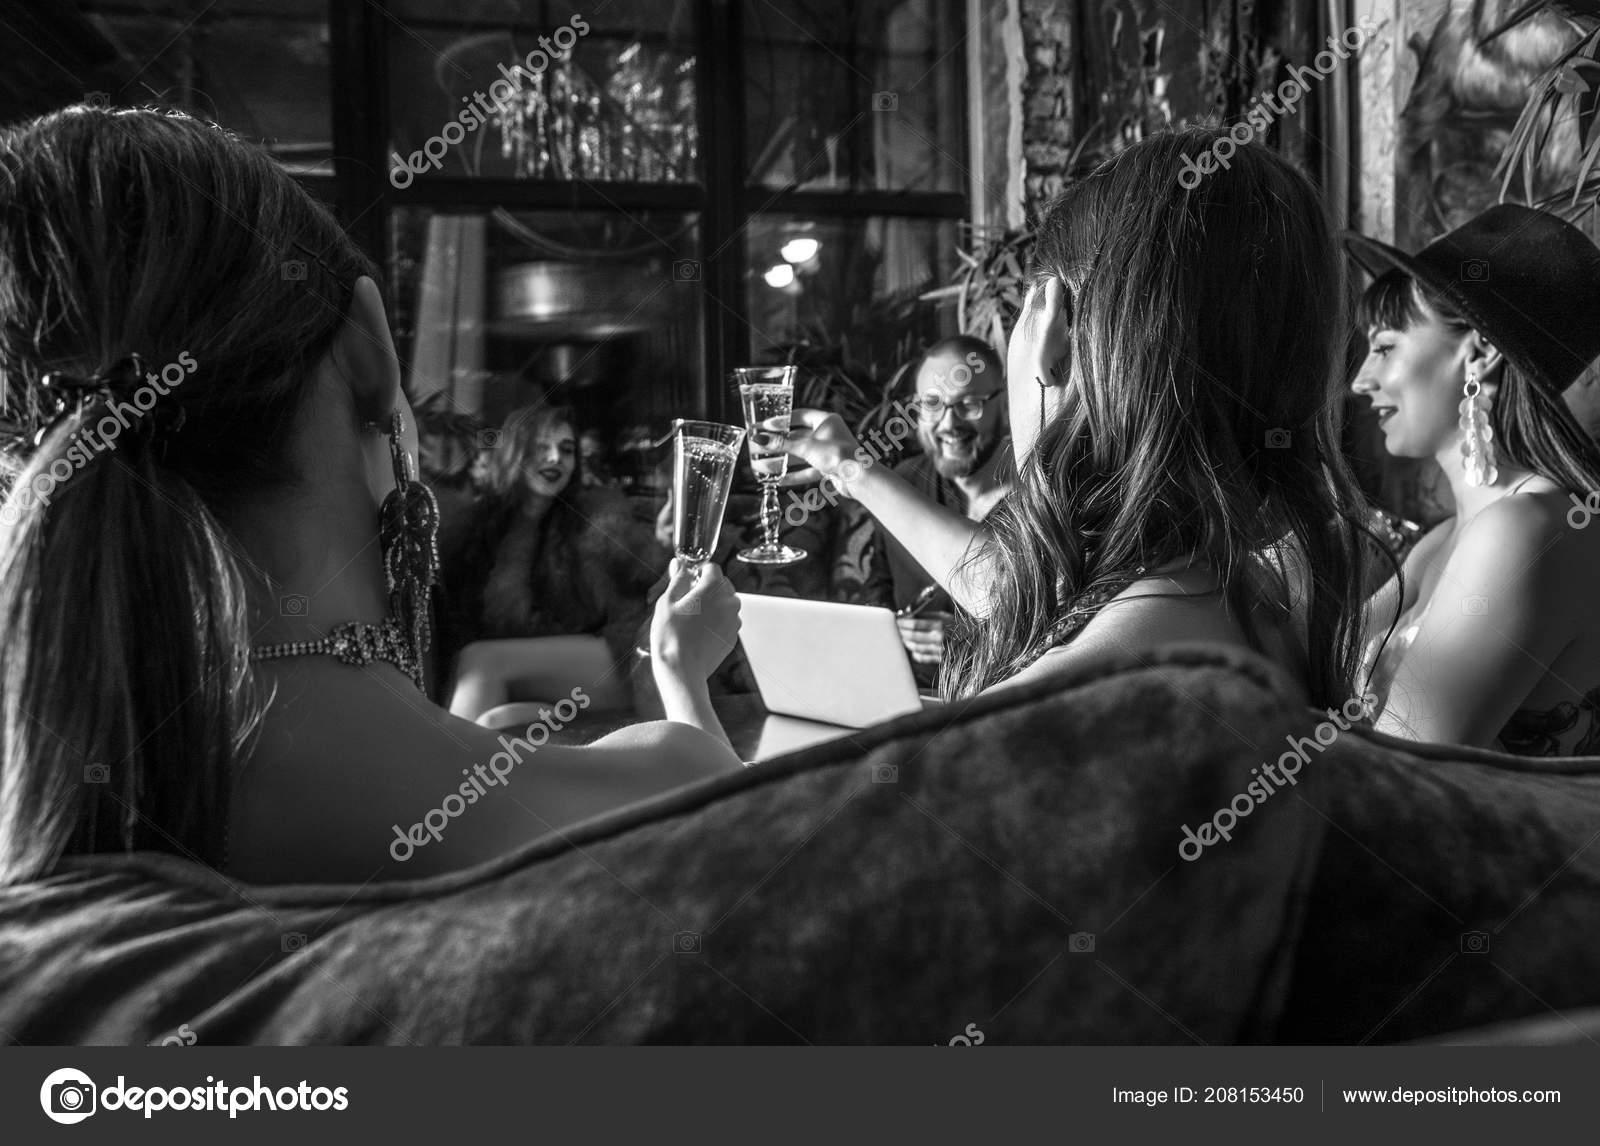 daafd4b982f Grupo Jovens Elegantes Vestidos Estilo Clássico Interior Clube Luxo —  Fotografia de Stock